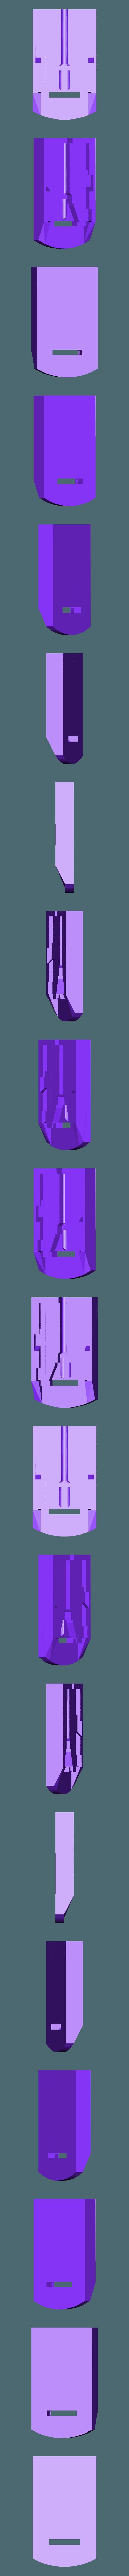 cradle_A.stl Download free STL file DJI Spark Battery cradle for Universal USB Charger Converter • 3D print model, mwilmars